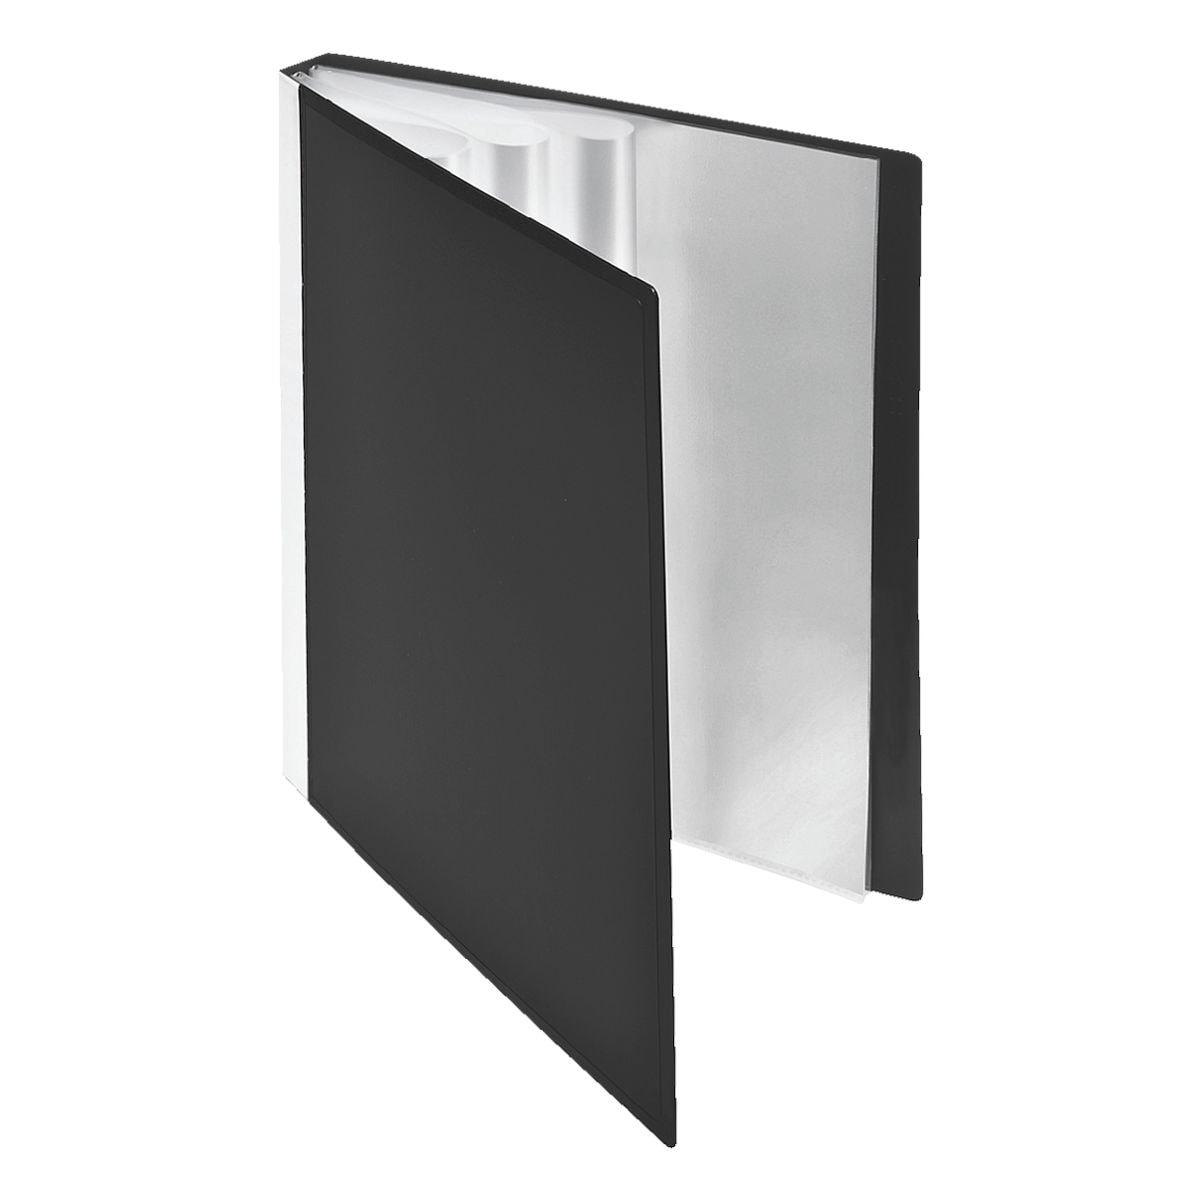 Foldersys Präsentations-Sichtbuch »Premium« A5 20 Hüllen